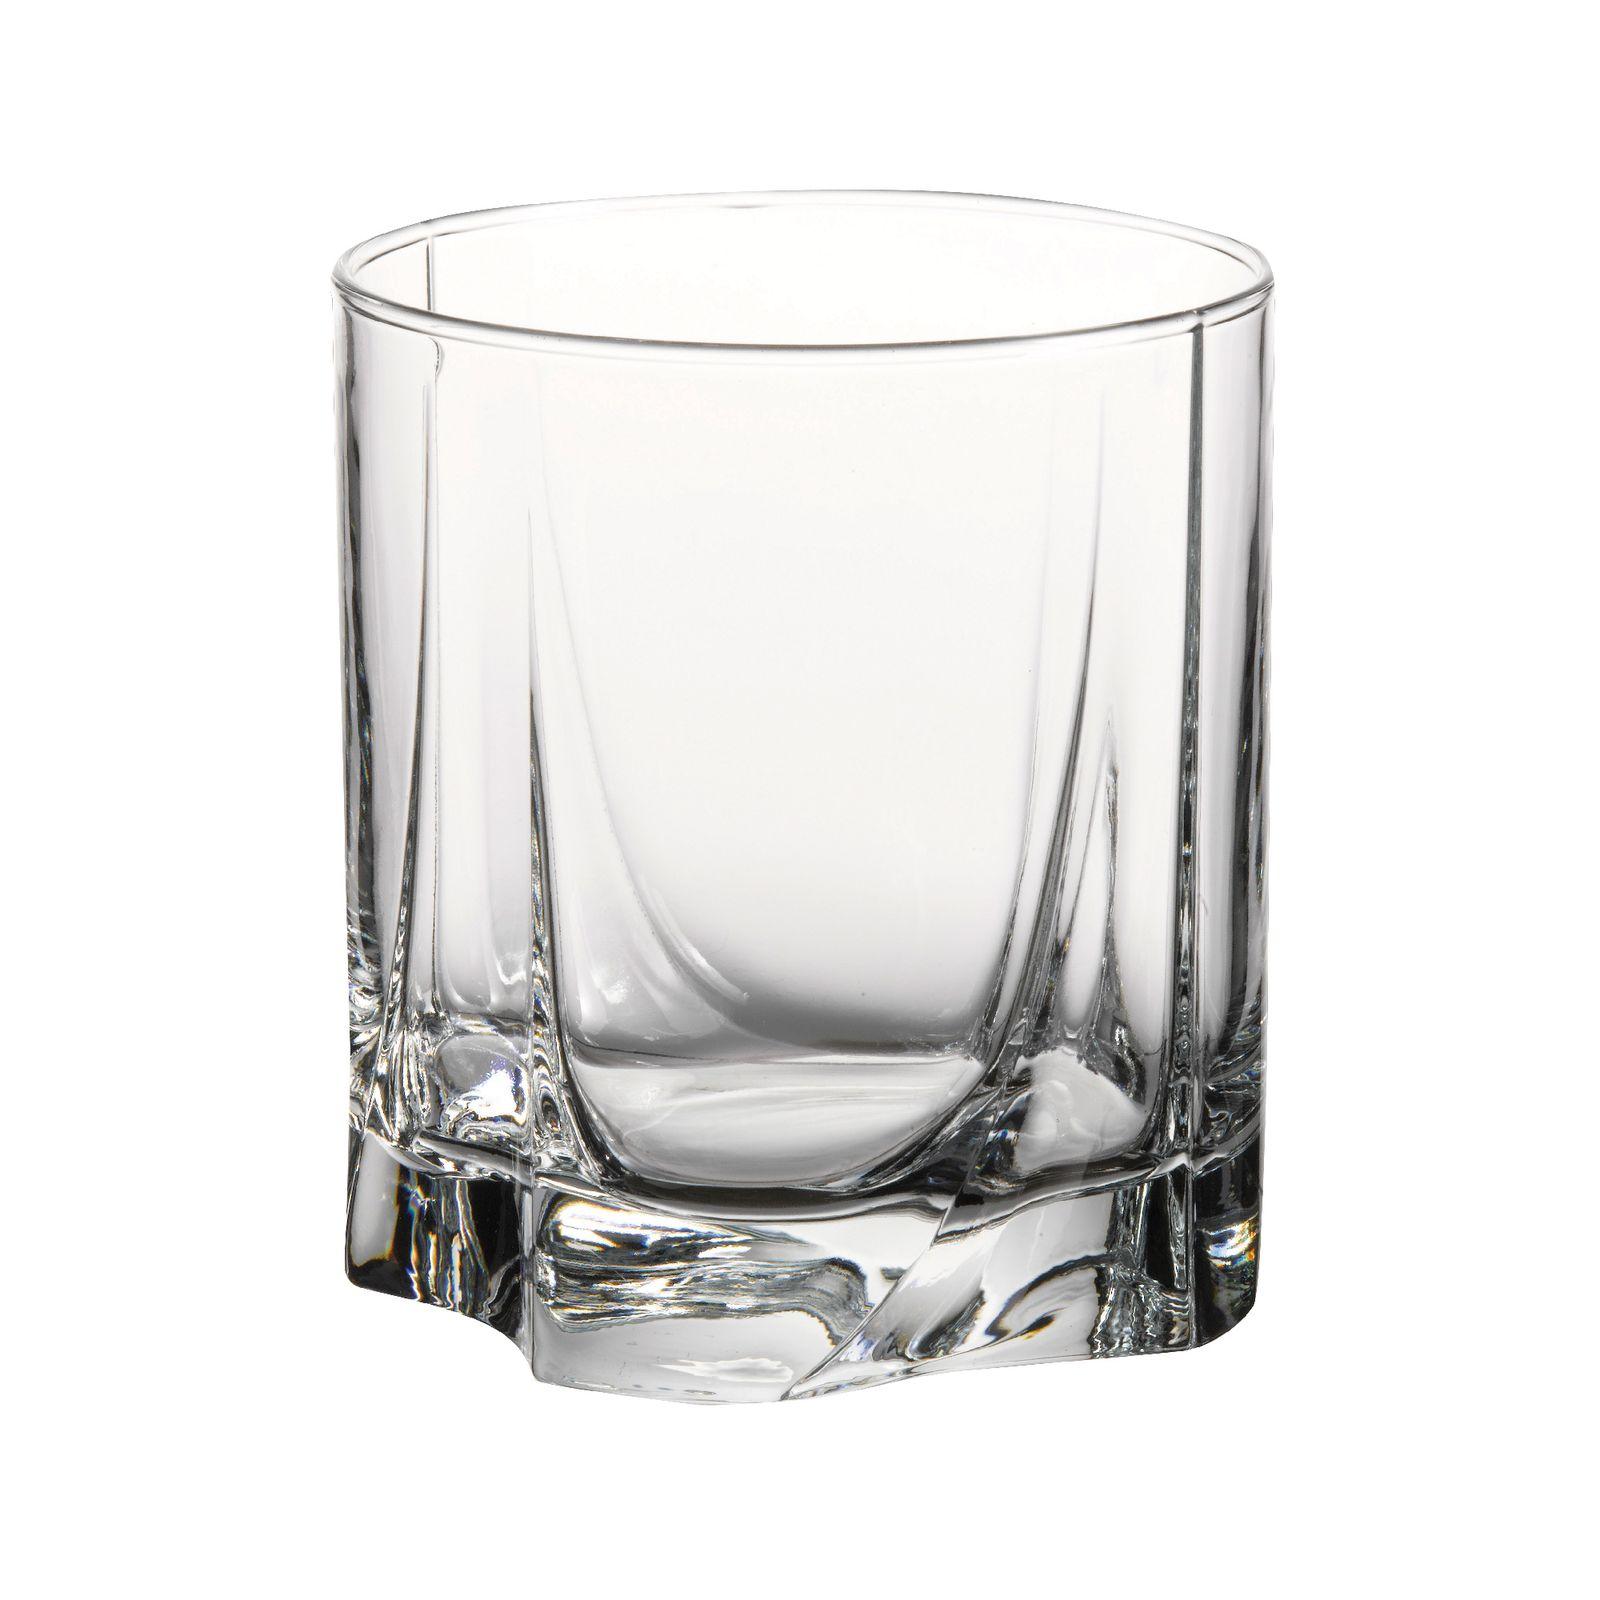 Set of 3 glasses Luna 245 ml PASABAHCE